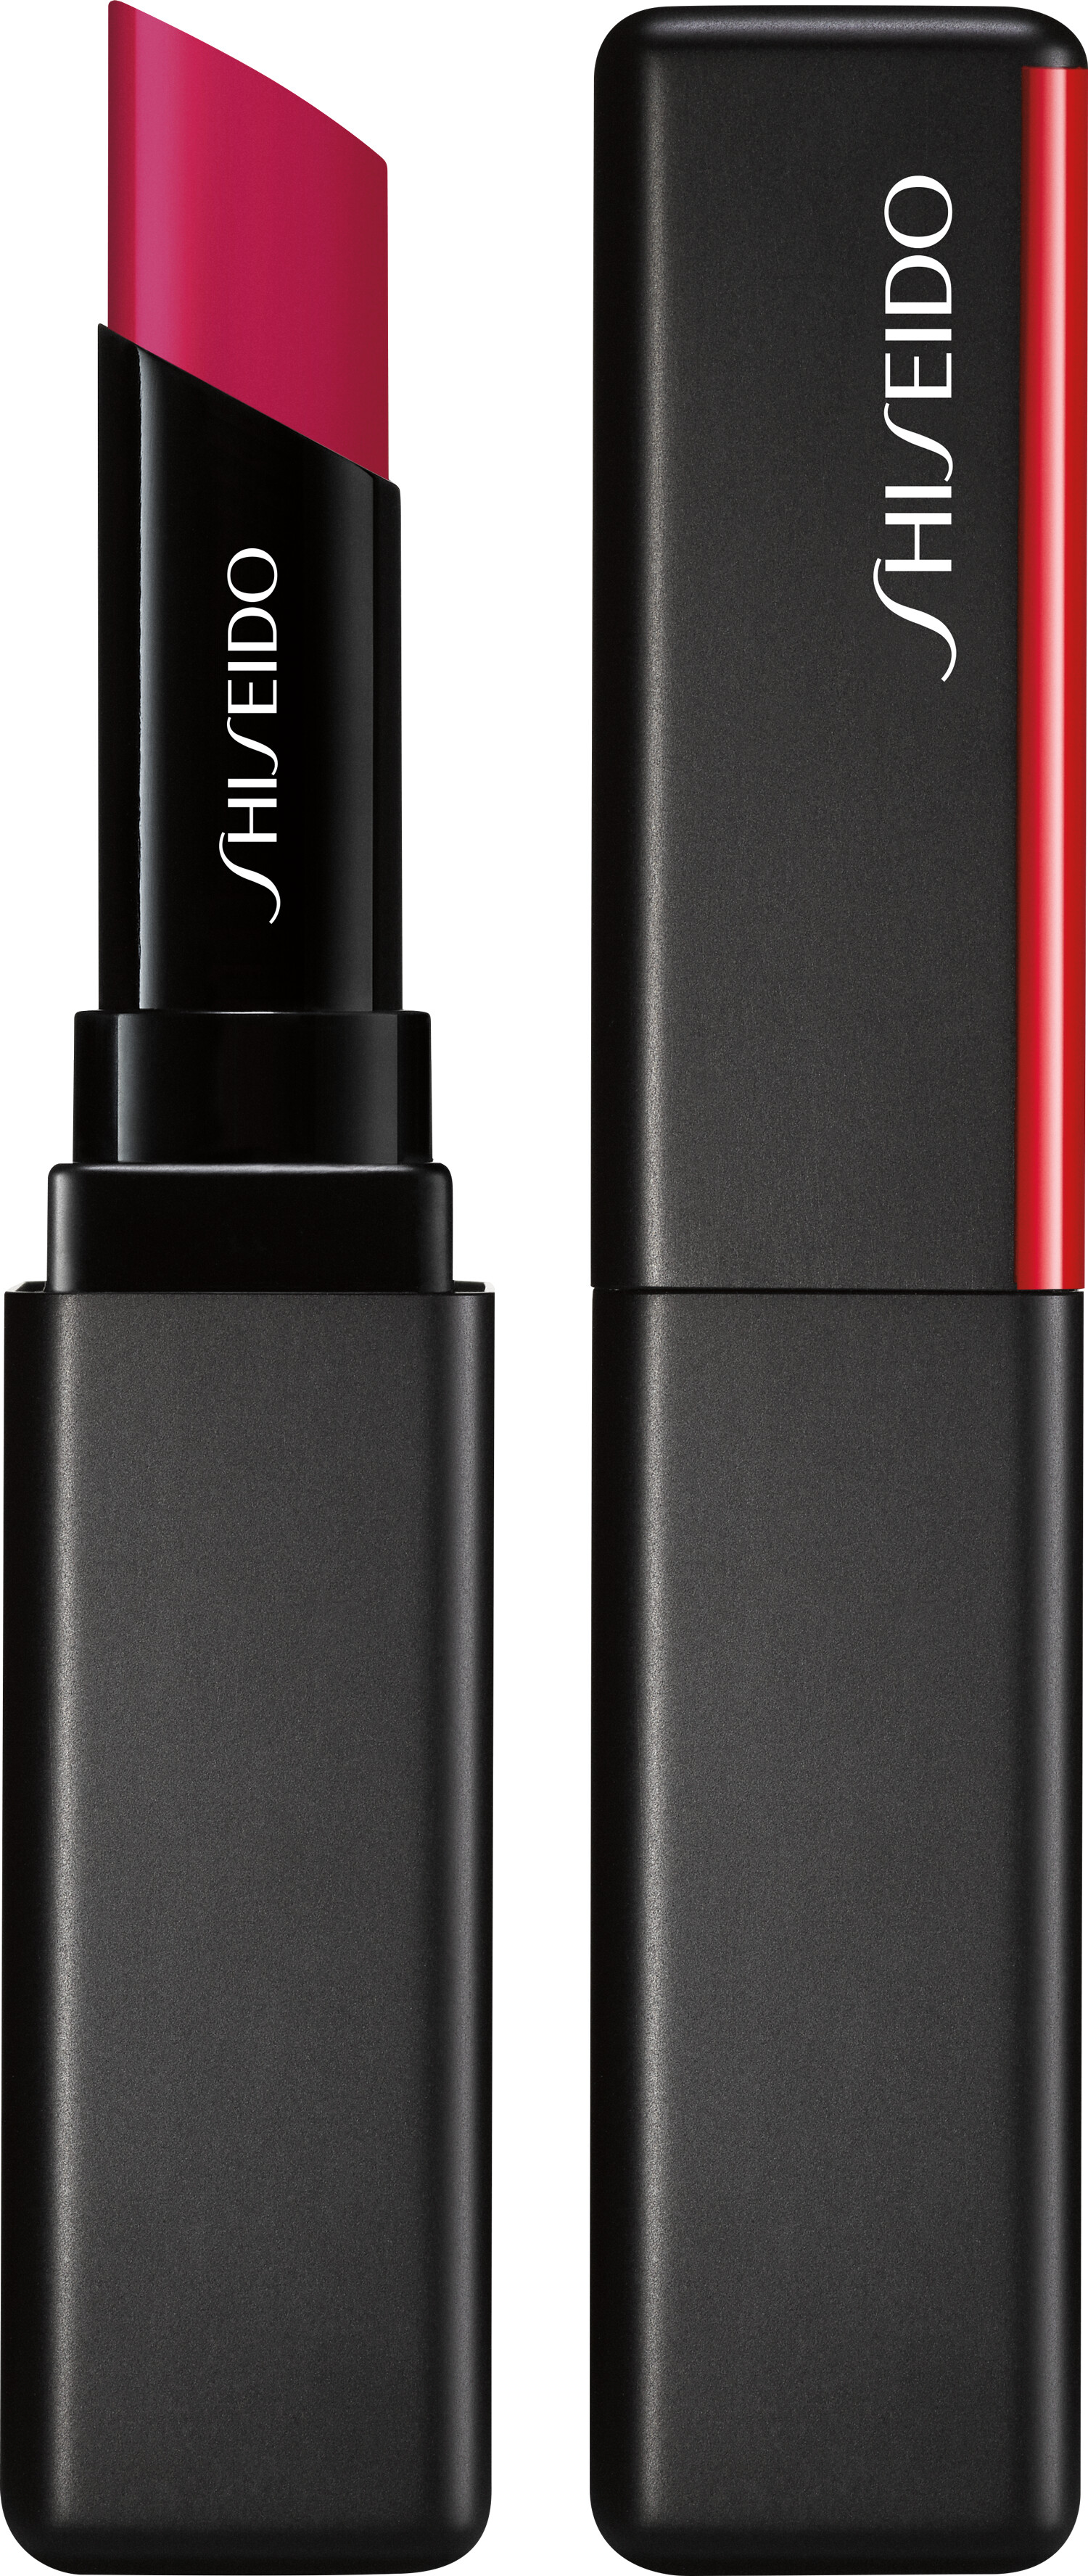 Shiseido VisionAiry Gel Lipstick 1.6g 214 - Pink Flash